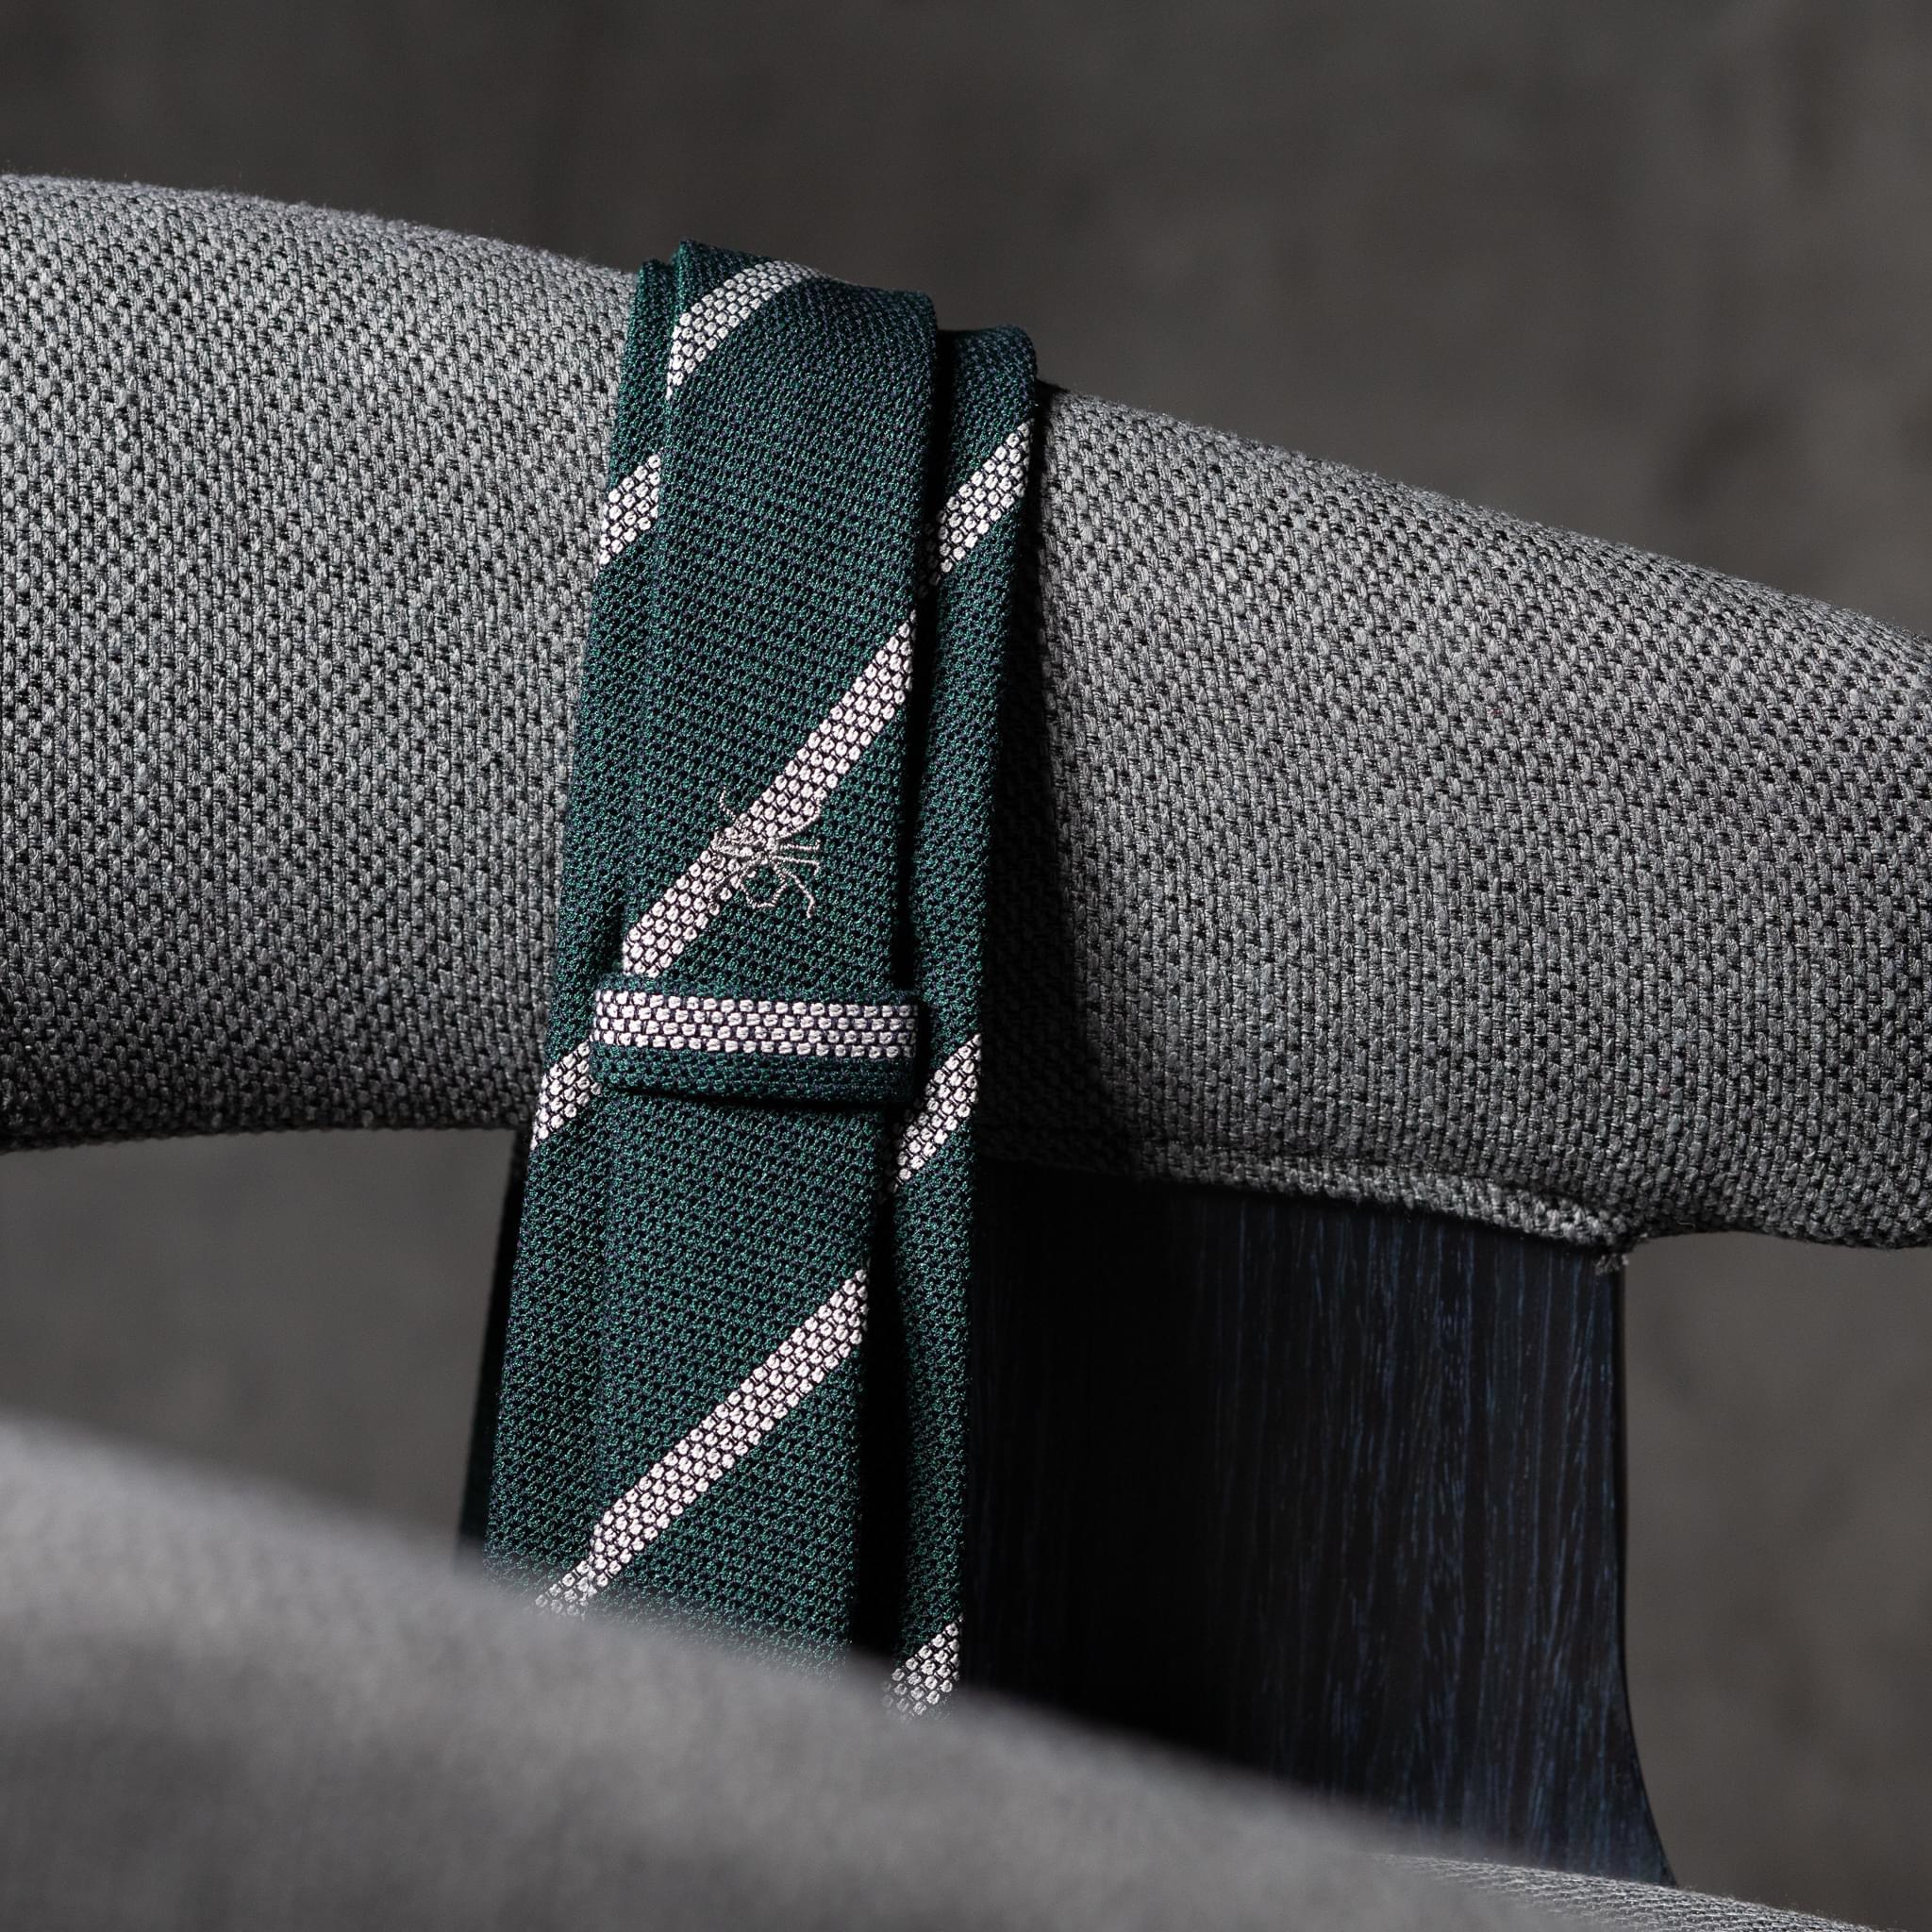 BOUCLÉ-0443-Tie-Initials-Corbata-Iniciales-The-Seelk-3